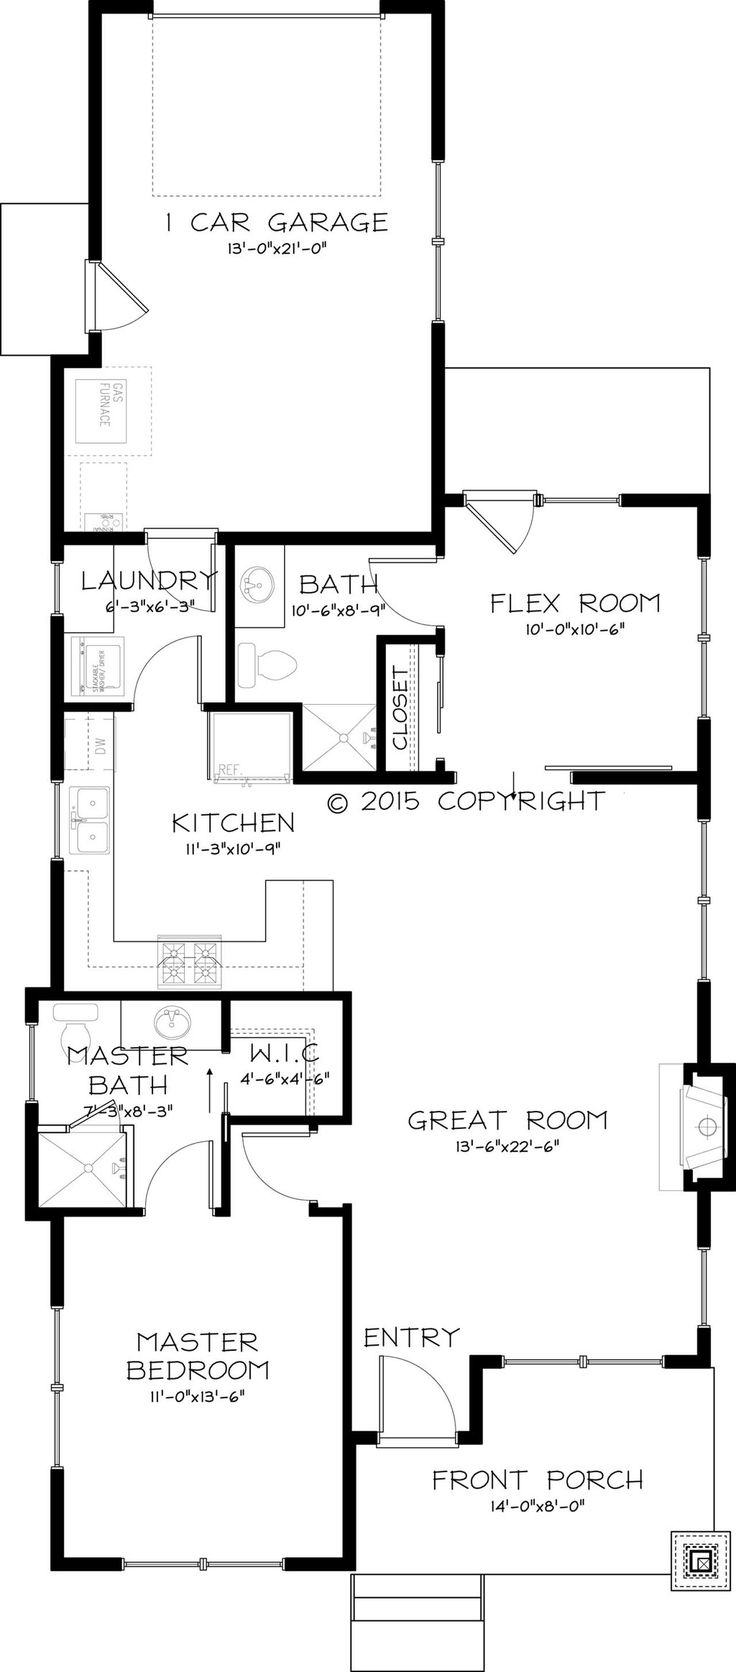 Craftsman style house plan 2 beds 2 baths 999 sqft plan 895